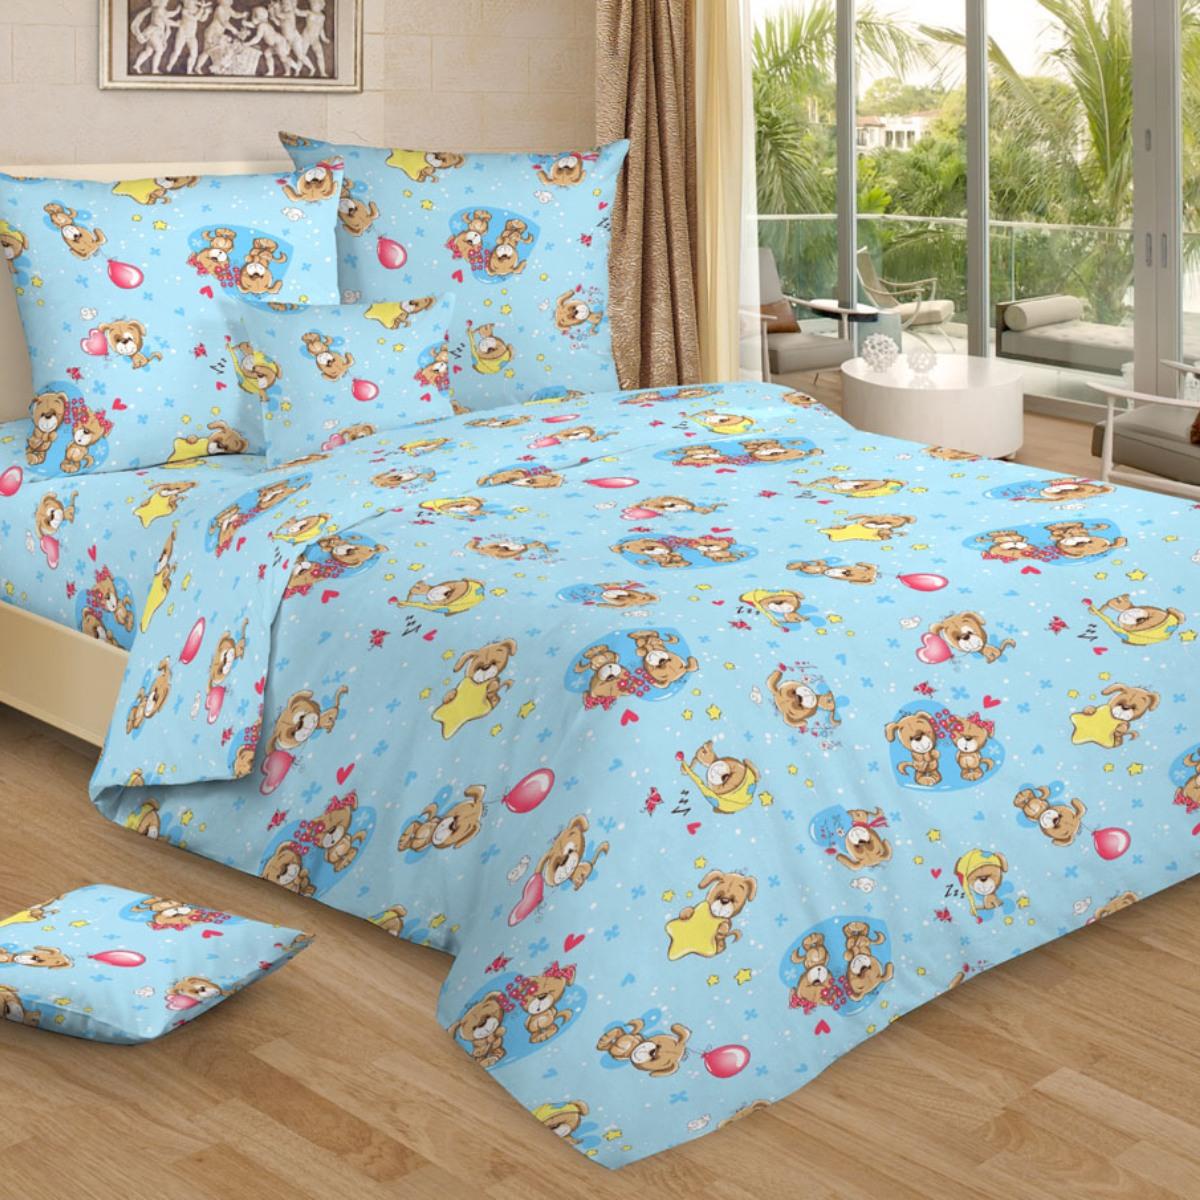 Letto Комплект в кроватку Ясли 3 предмета BG-73, Letto Home Textile